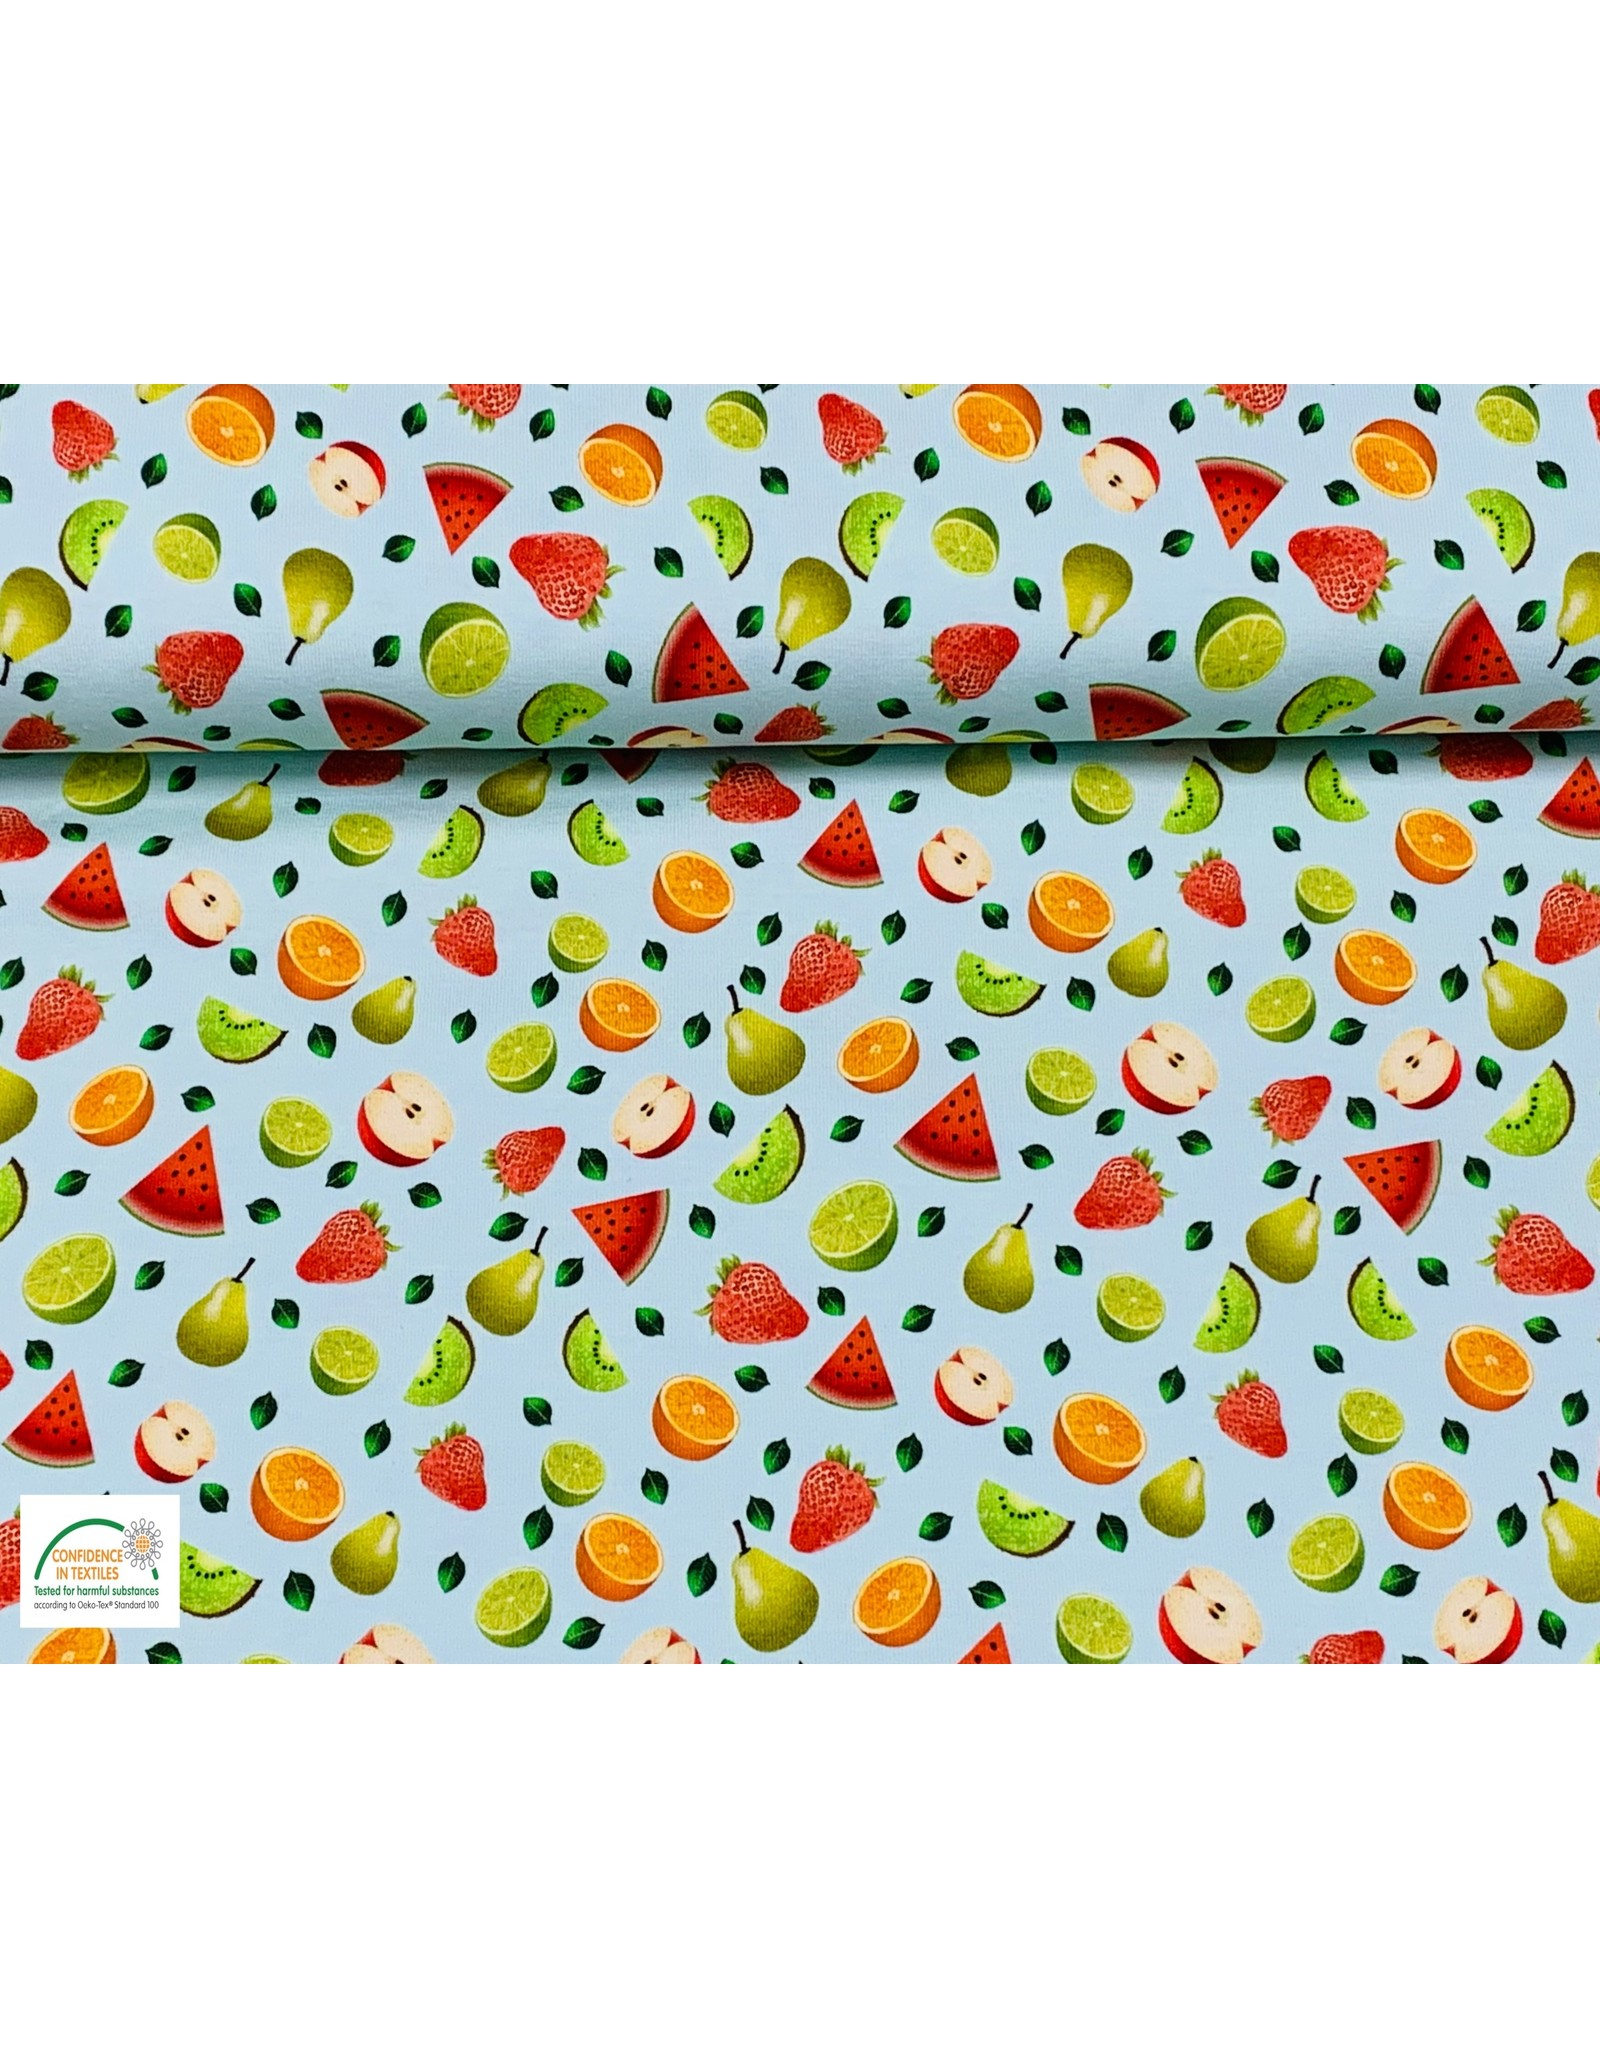 Megan Blue Fabrics Bauwmolljersey Fruits mint